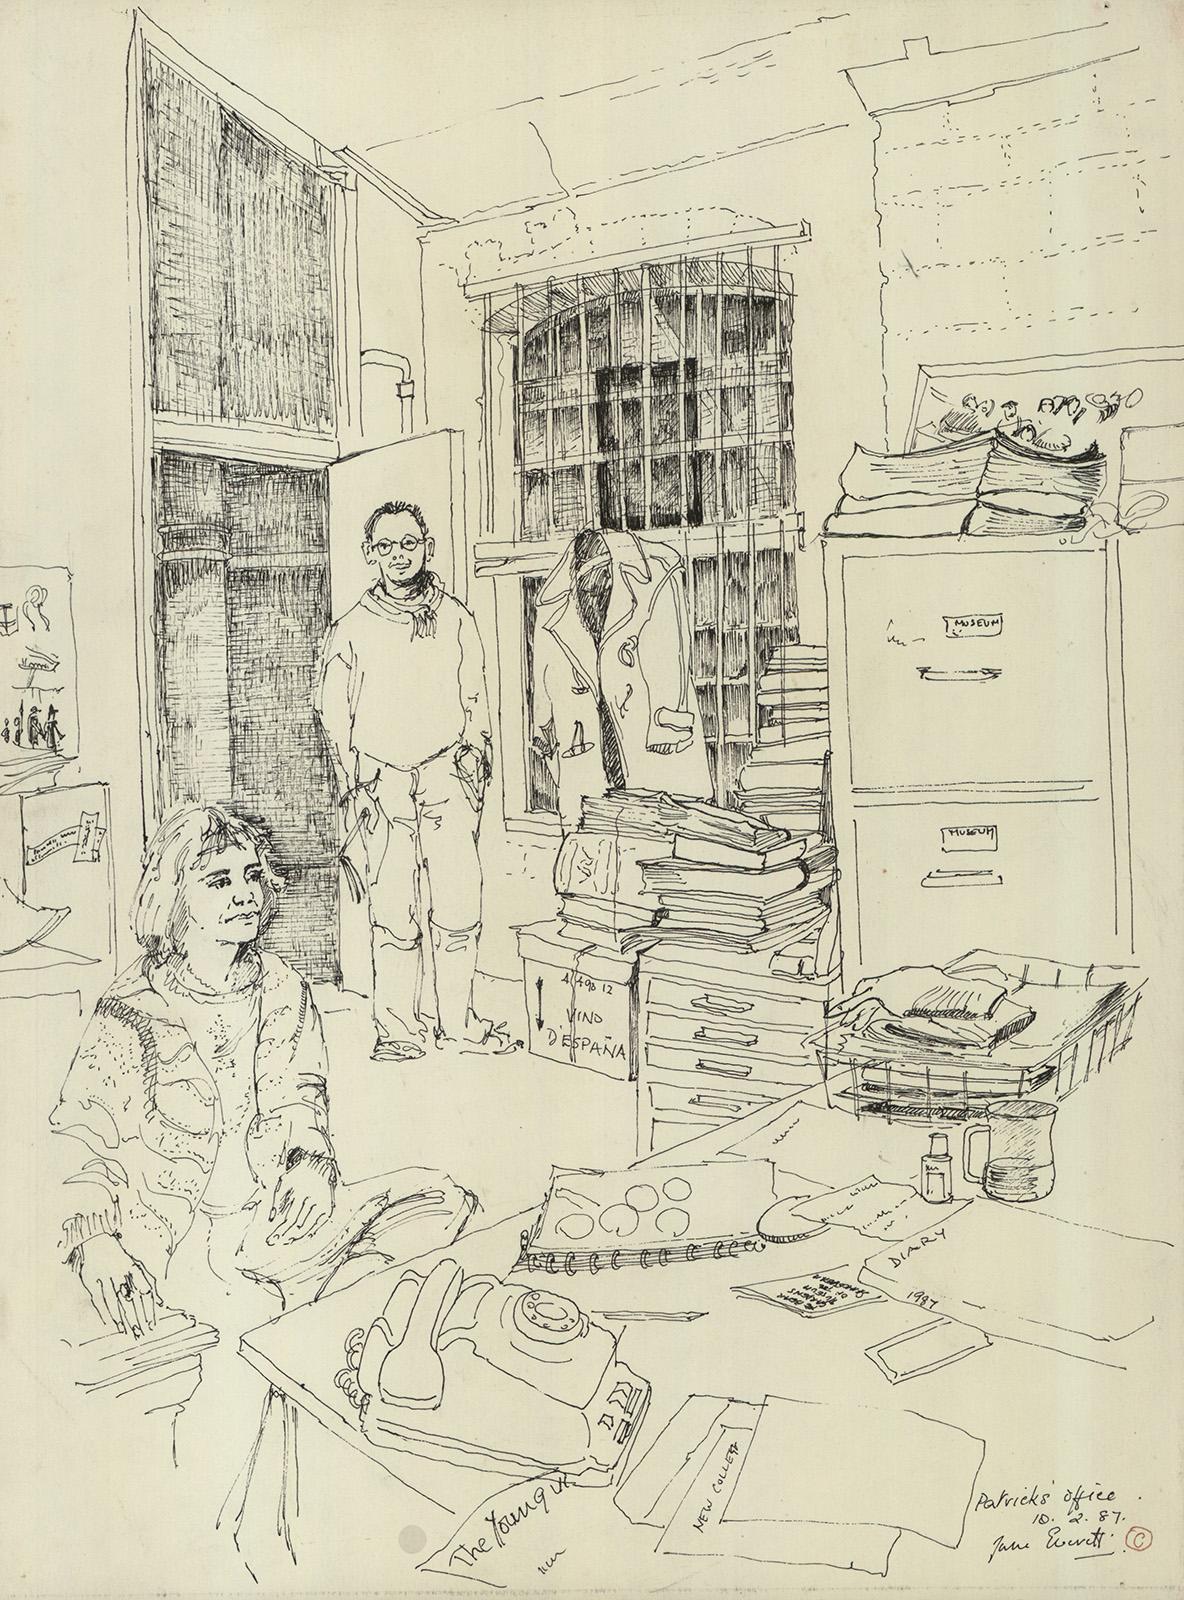 A sketch of an office.